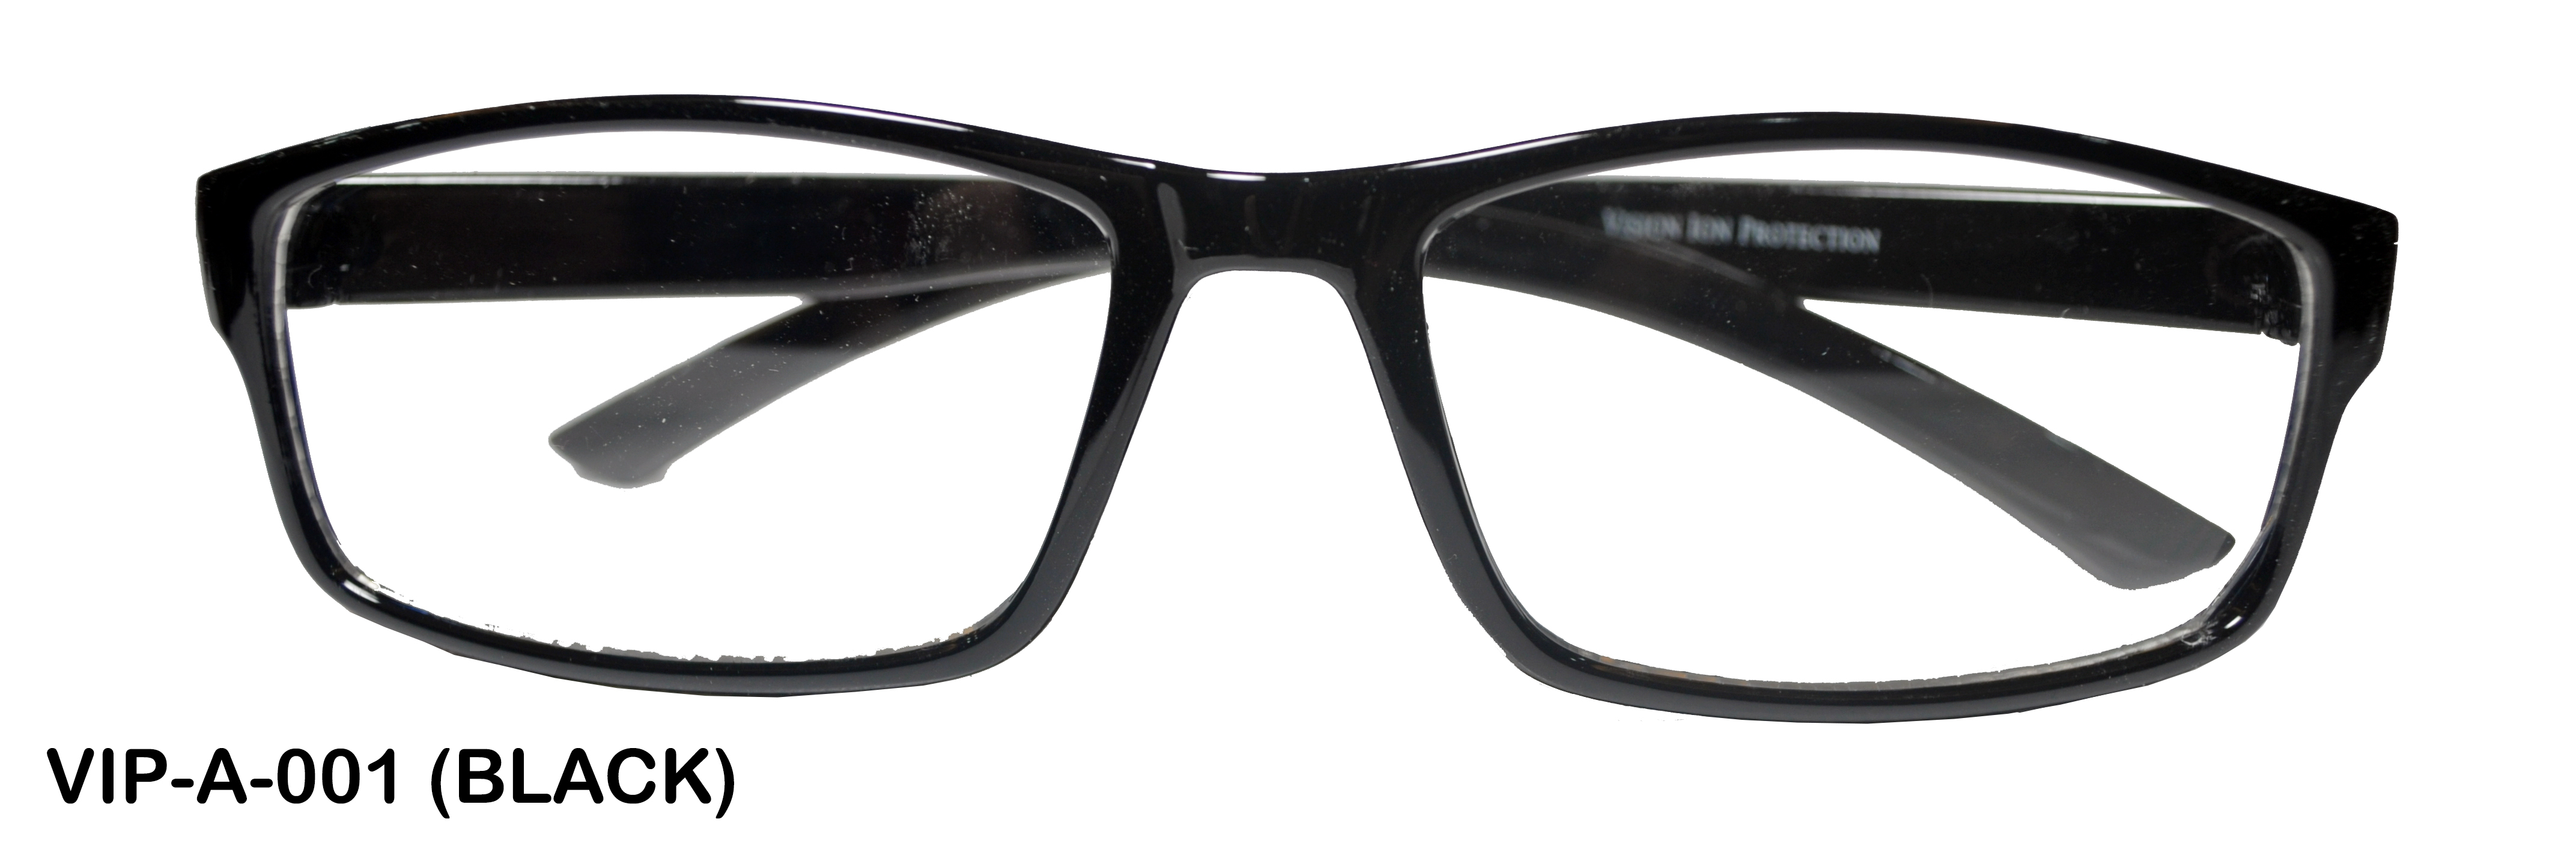 vip-a-001-black